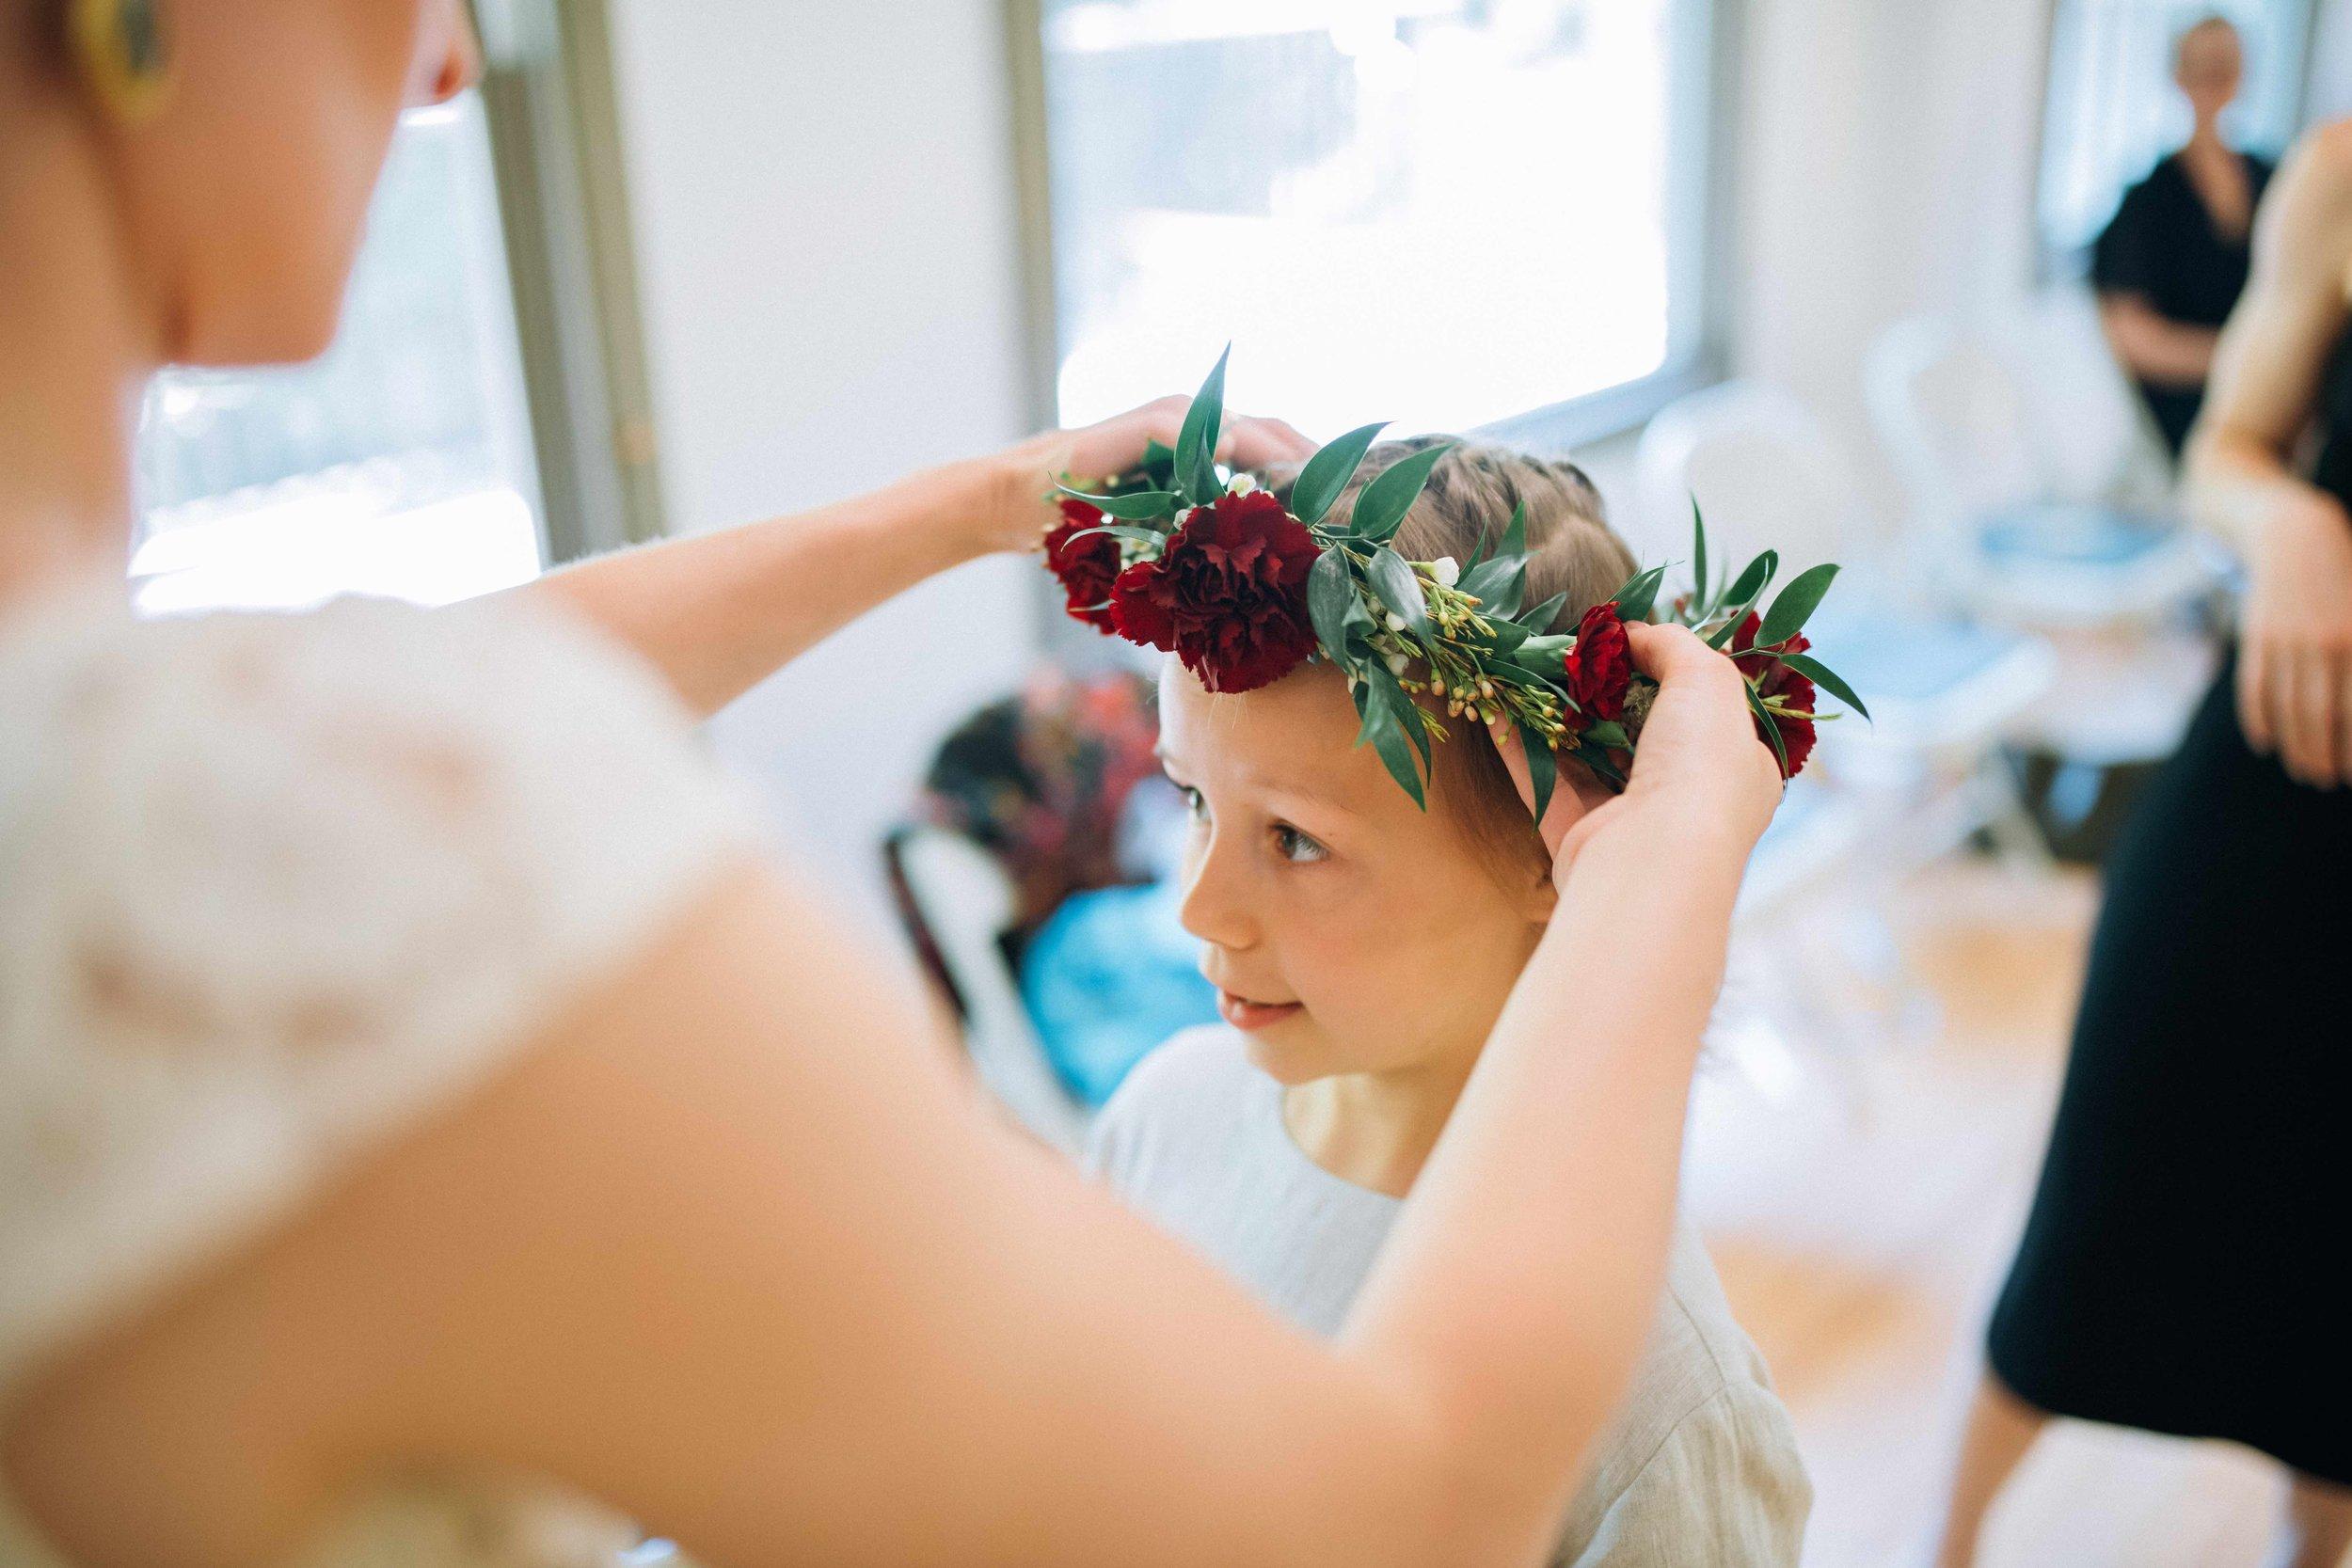 DetailsNashville-Hannah+AndrewWedding-WeddingDay102.jpeg